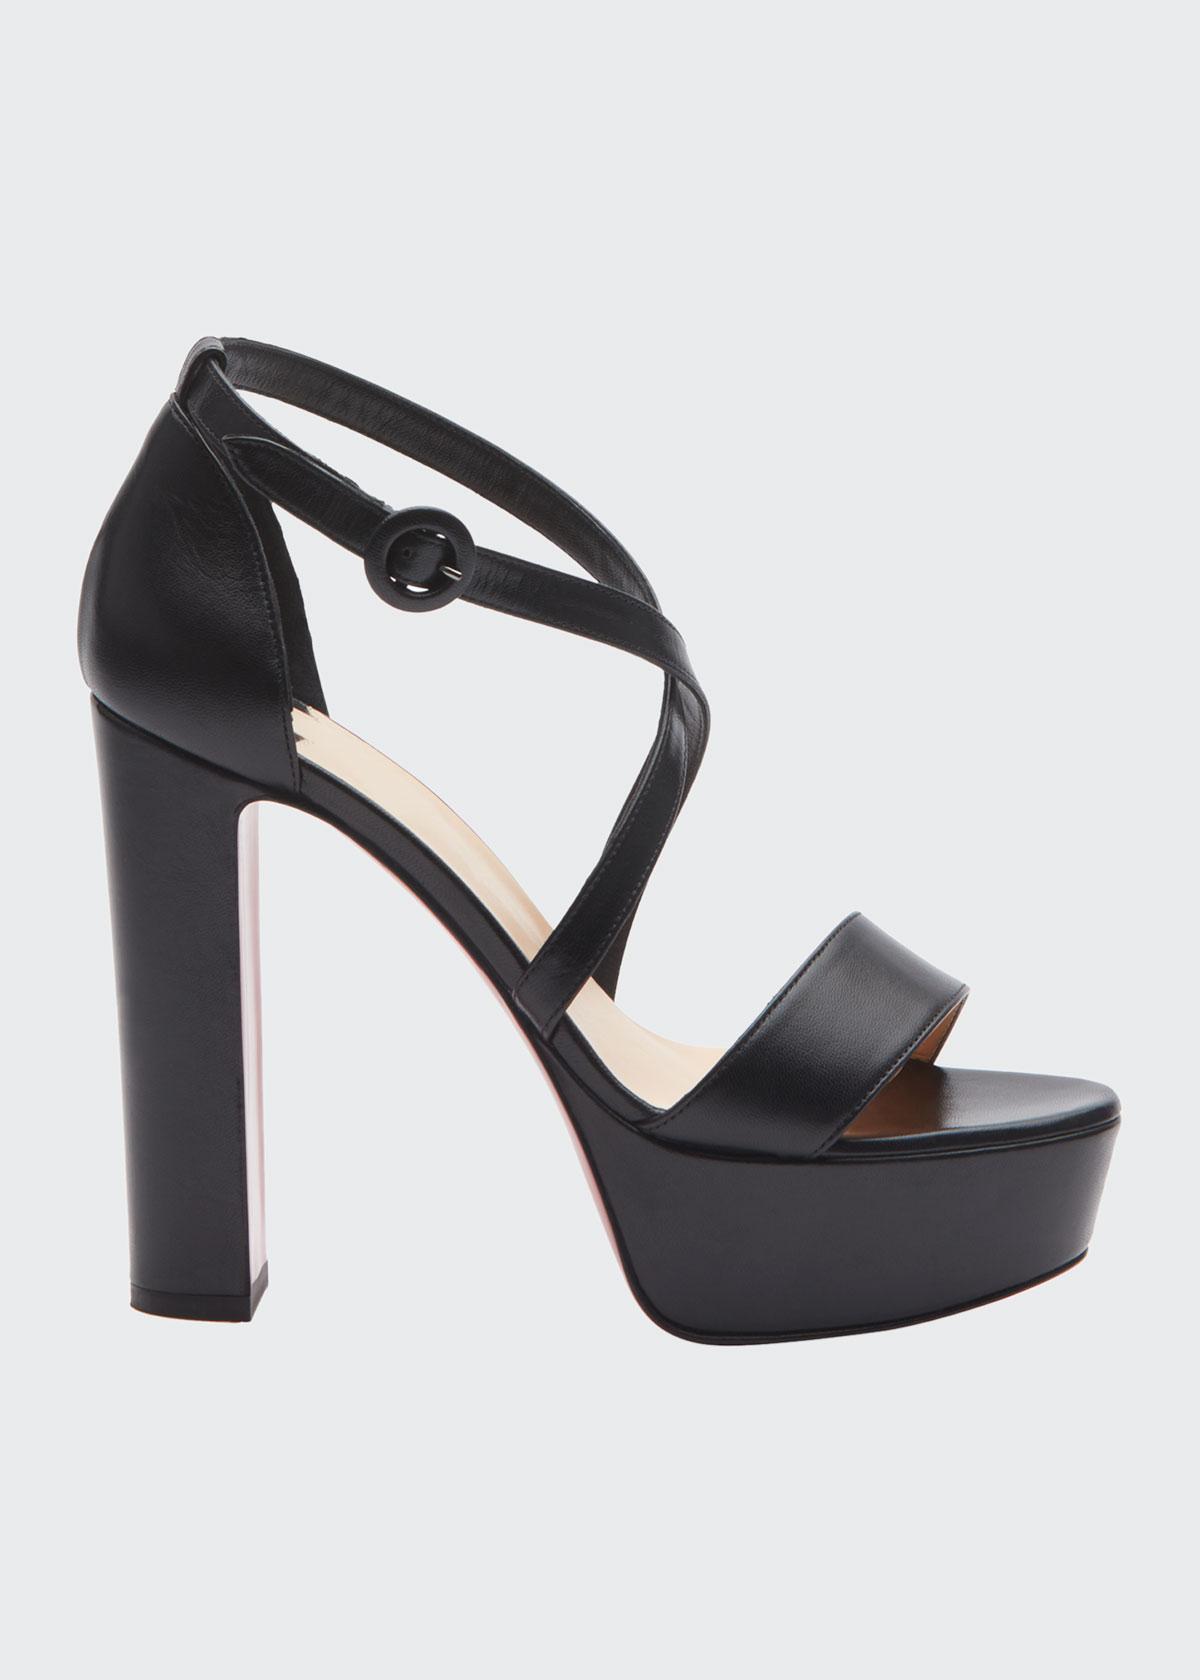 Christian Louboutin High heels LOUBI SLEEK LEATHER RED SOLE PLATFORM SANDALS